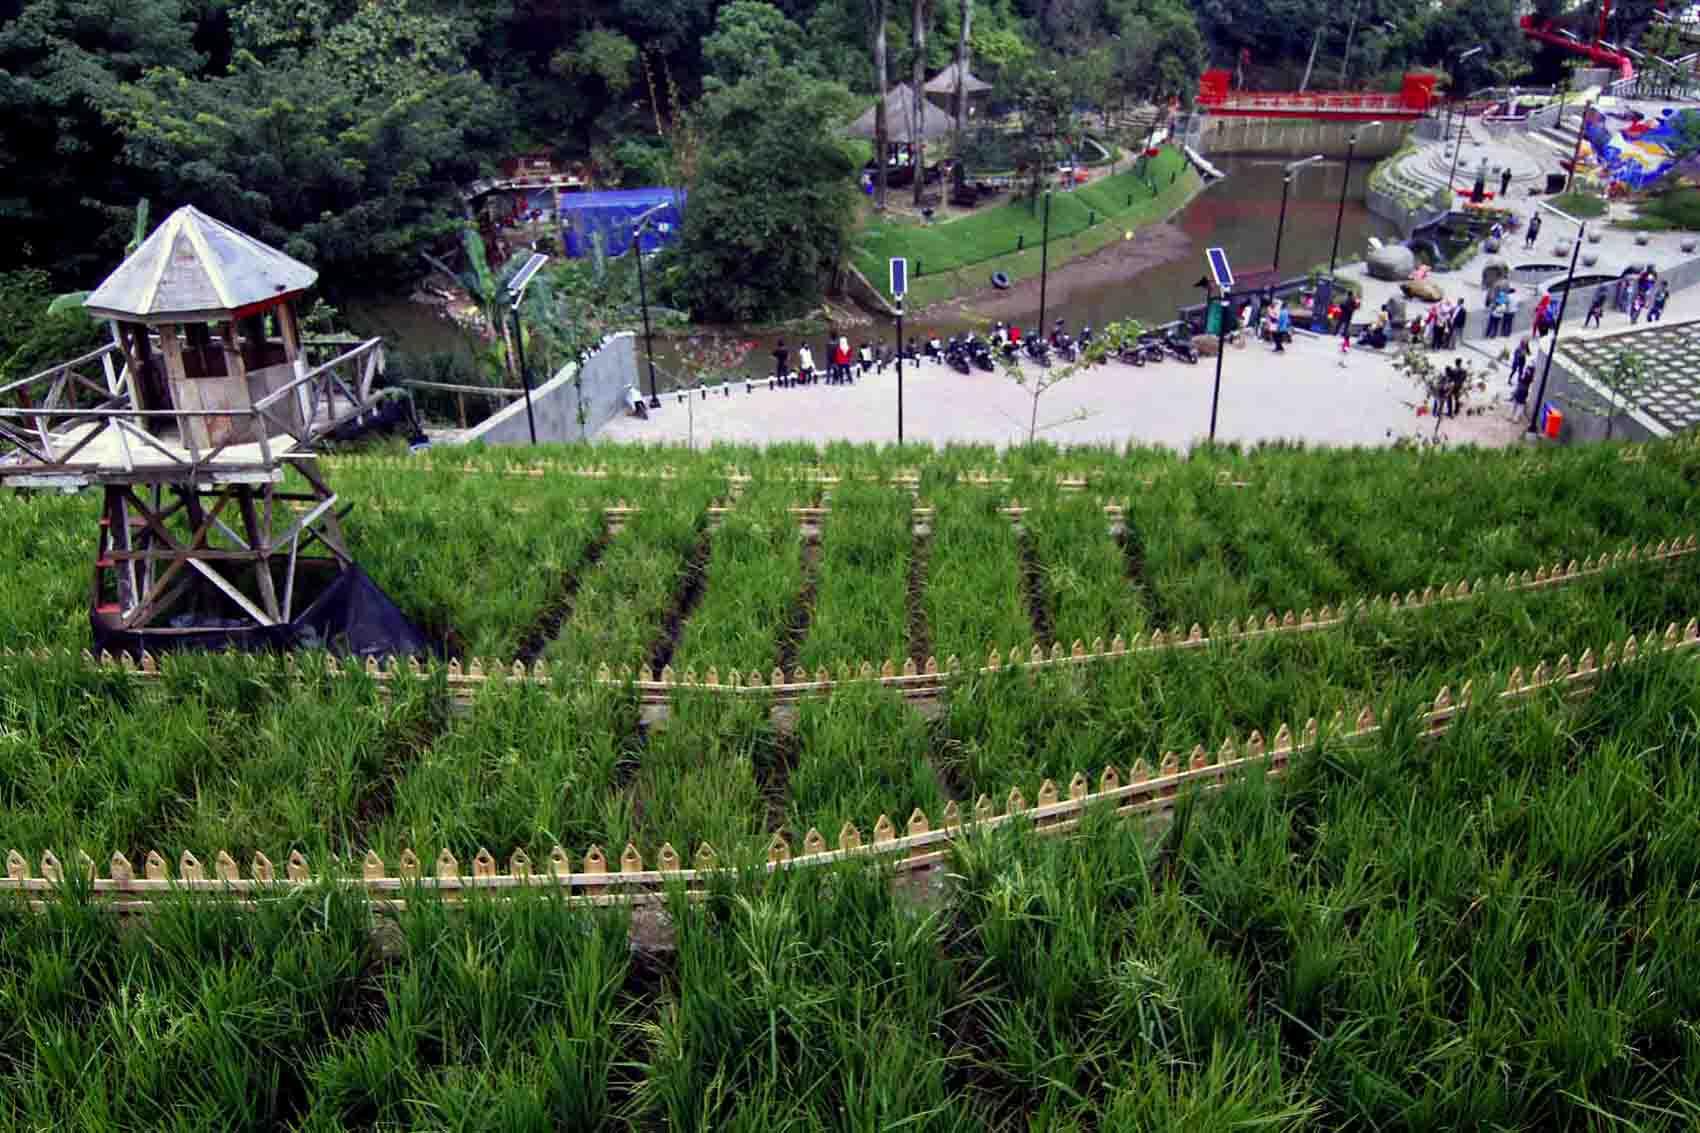 Rth Bandung Nambah 1 09 Persen Dua Teras Cihampelas Kab